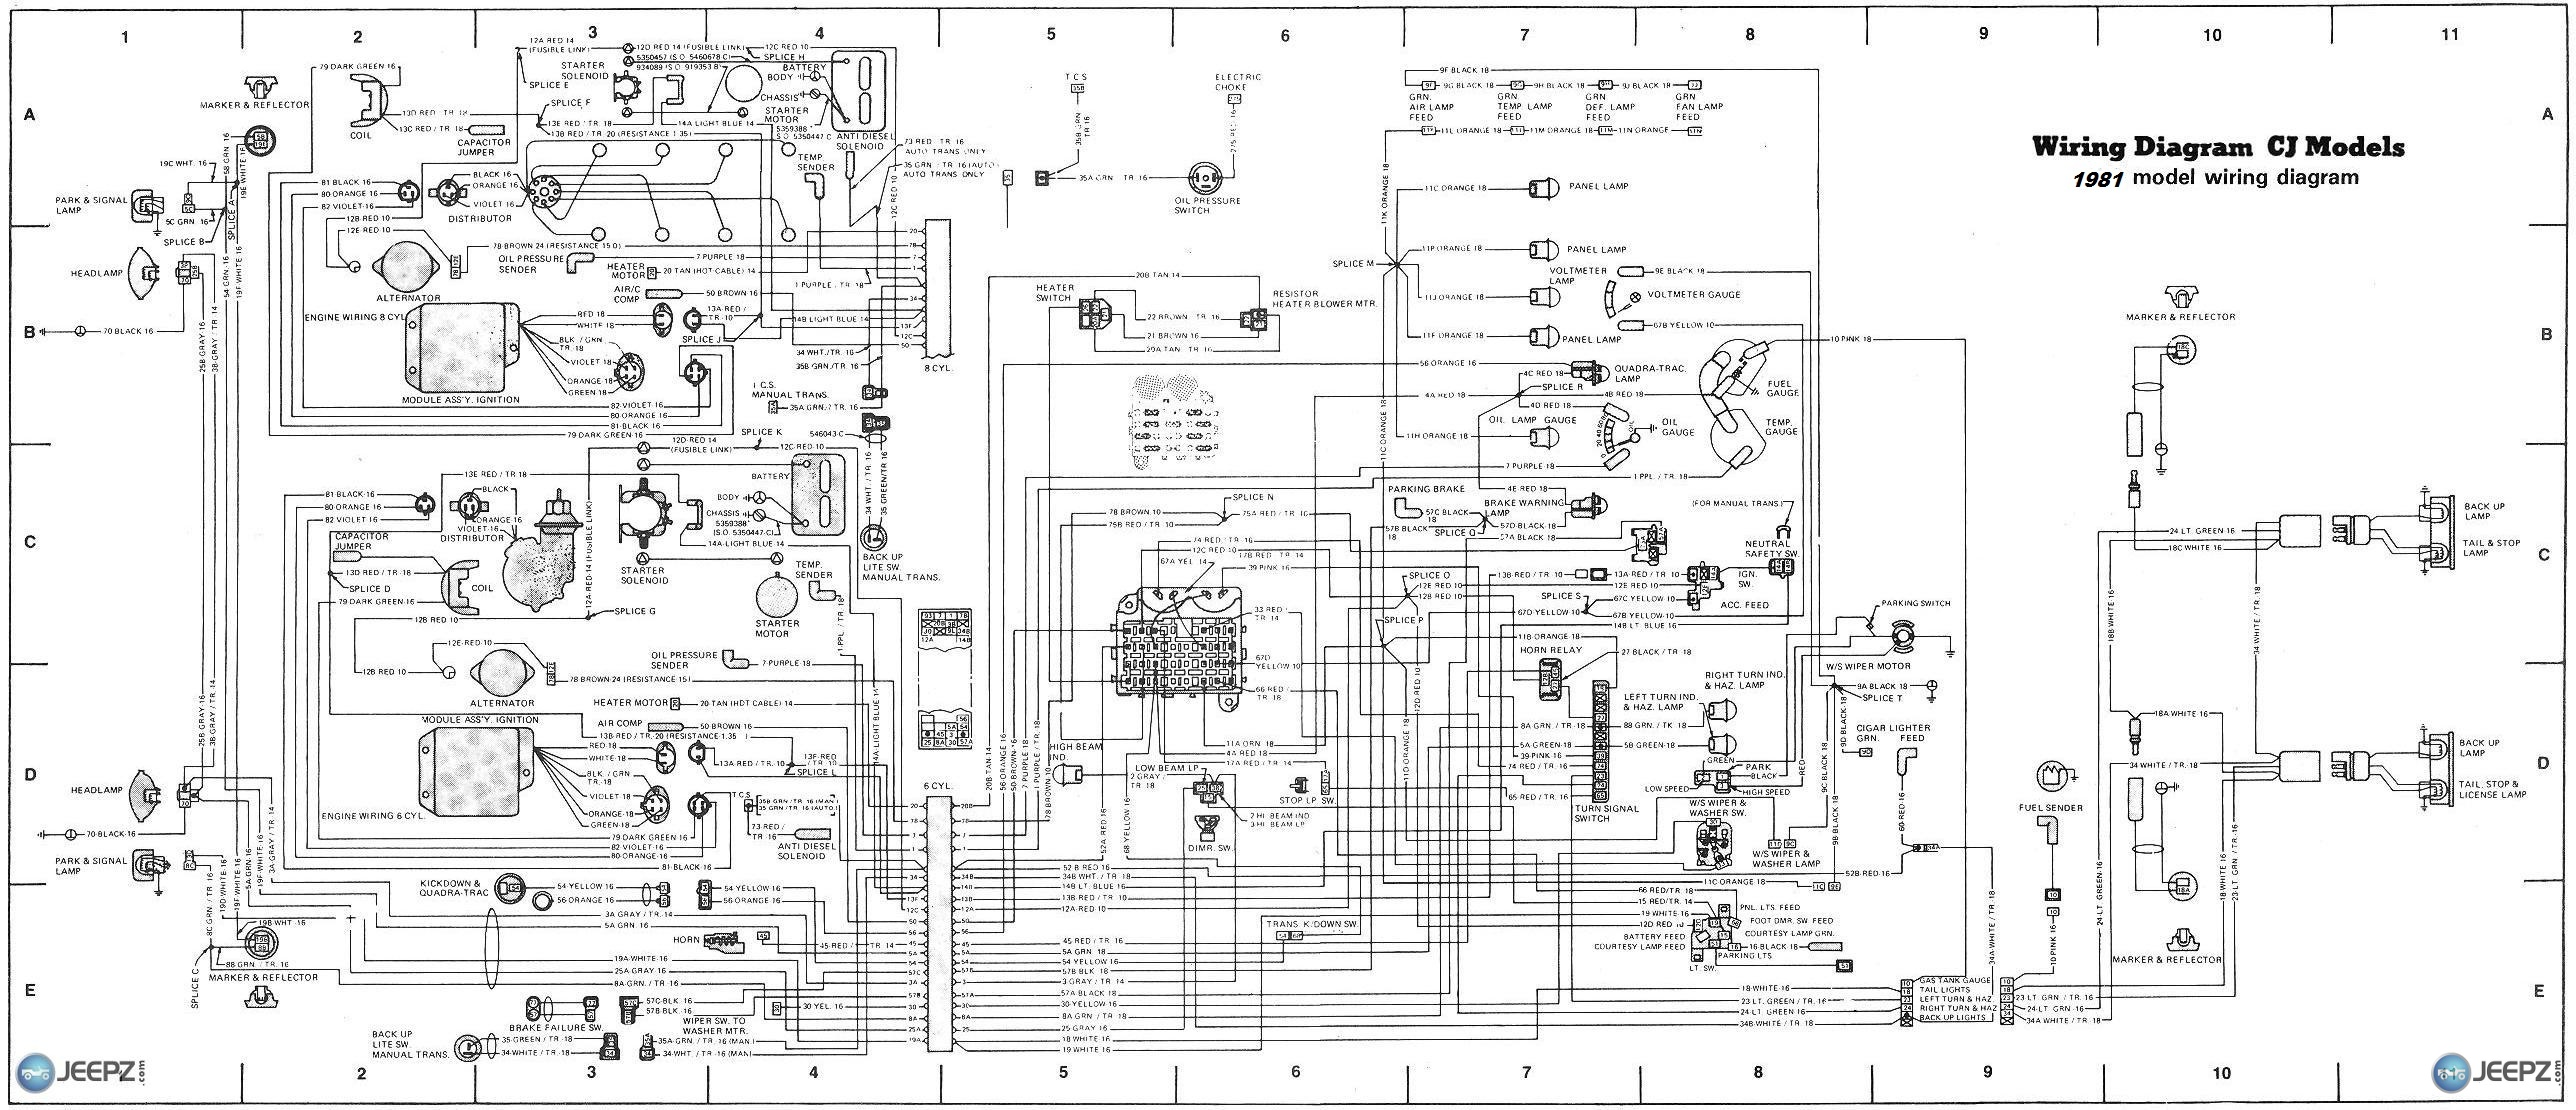 1796 cj7 fuse box diagram wiring diagram g8 1986 jeep cj7 fuse box diagram 1980 jeep cj7 fuse box diagram #10